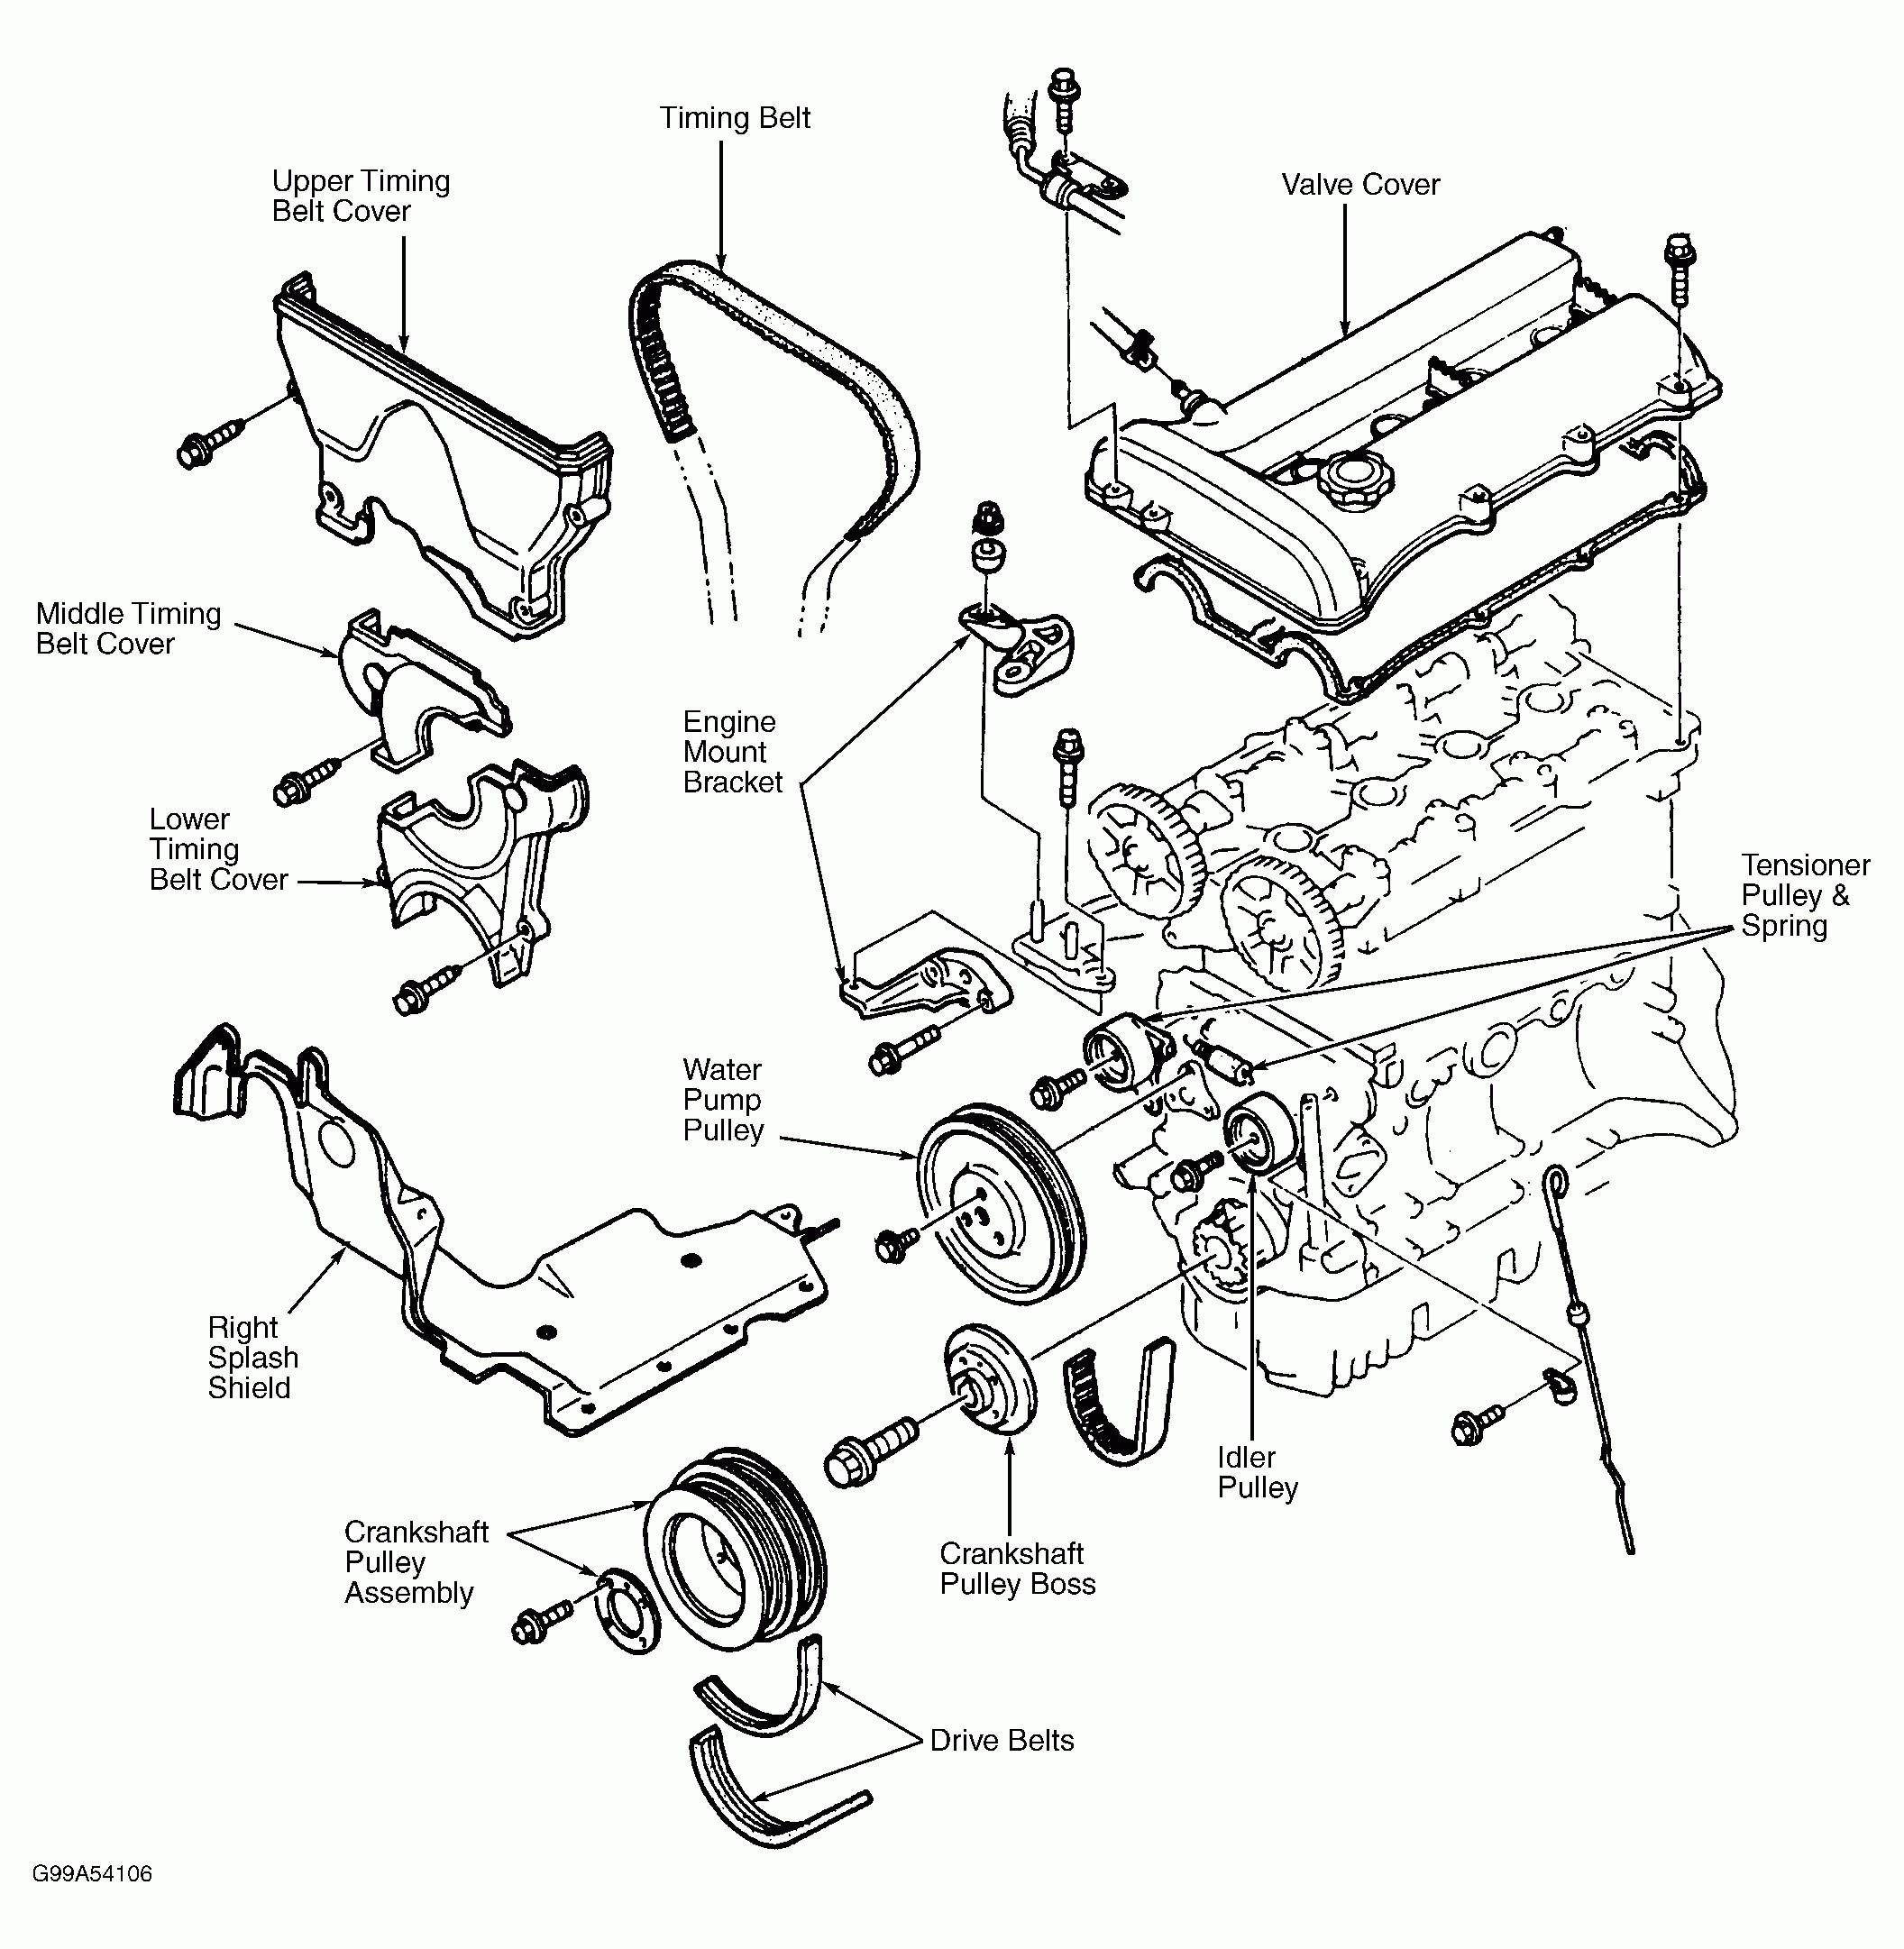 mazda protege engine diagram my wiring diagram rh detoxicrecenze com  mazda engine diagrams